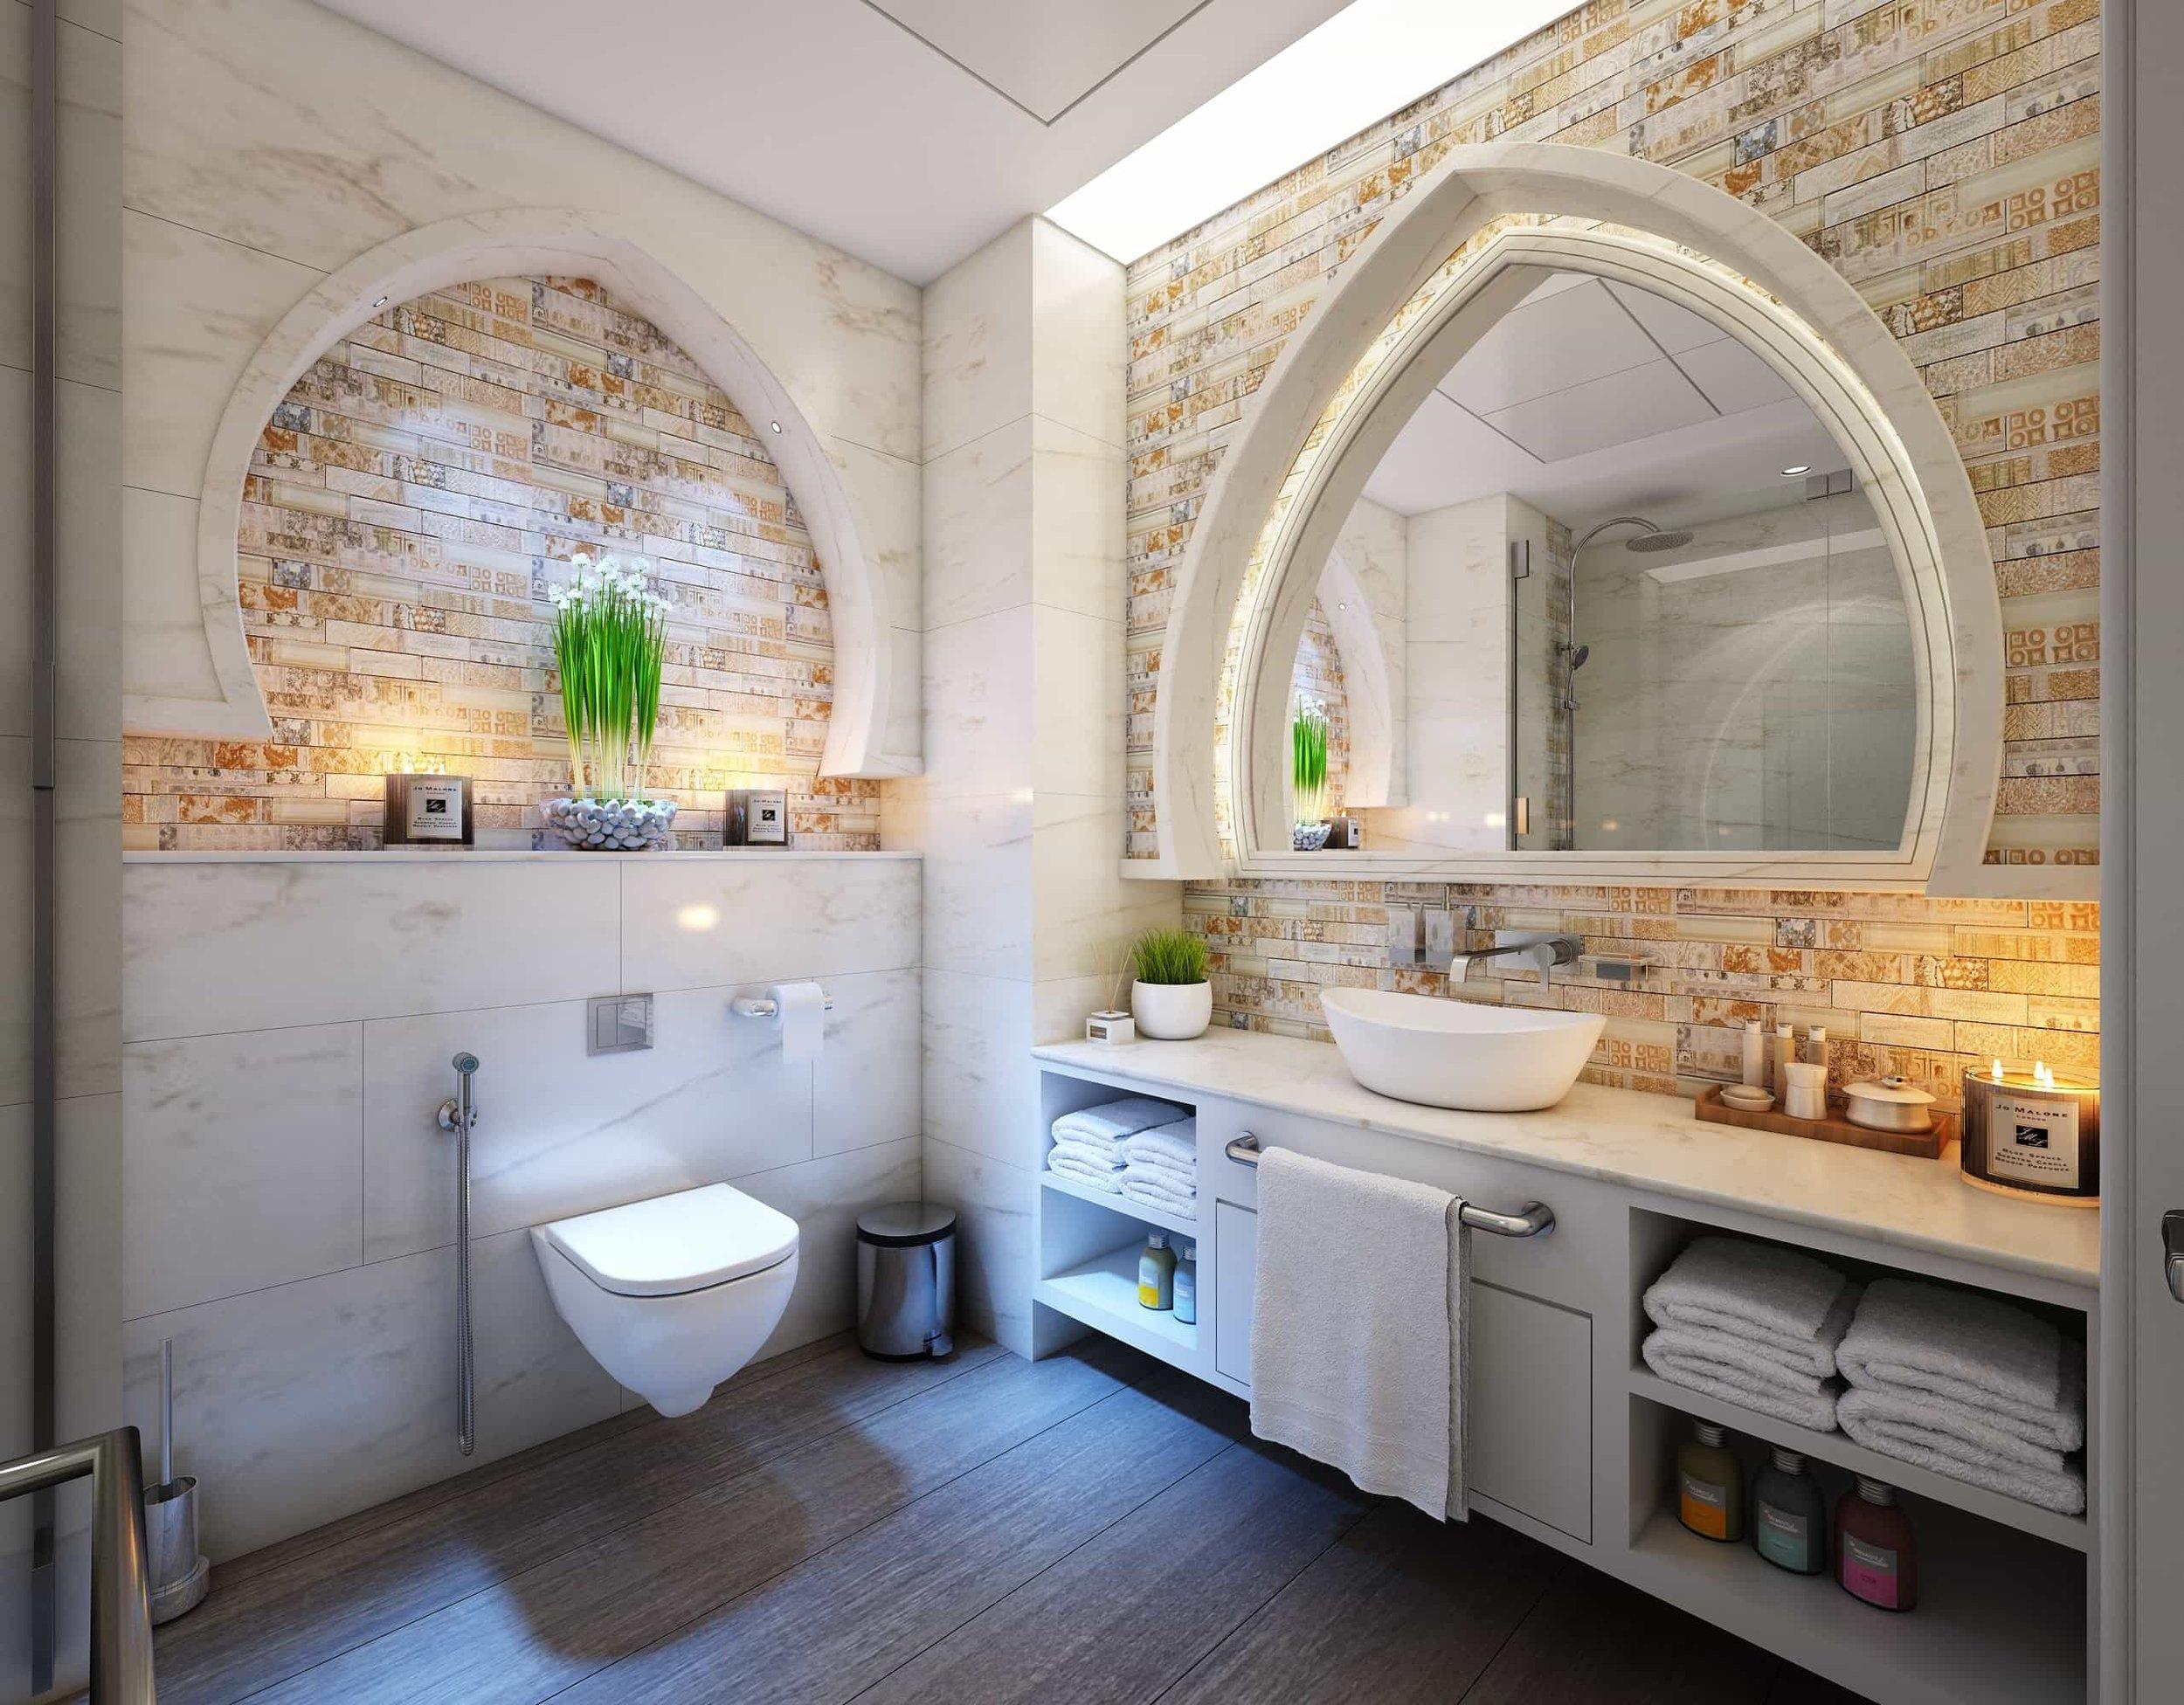 Airbnb Essentials Blog - Pic Optimized.jpg